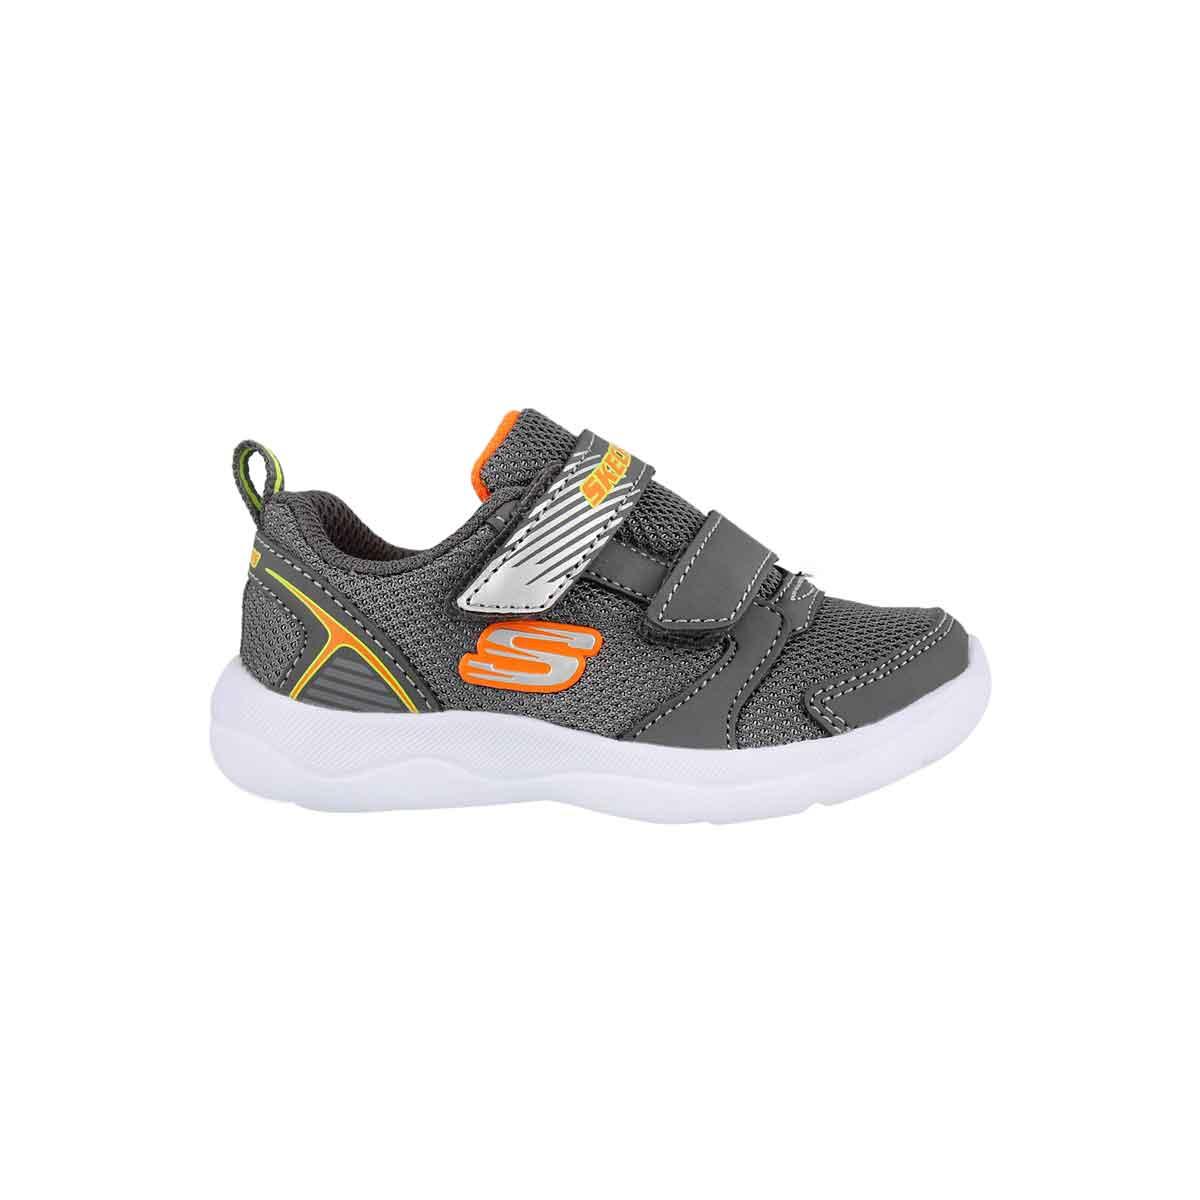 Inf-b Skech-Stepz 2.0 char/orng sneaker